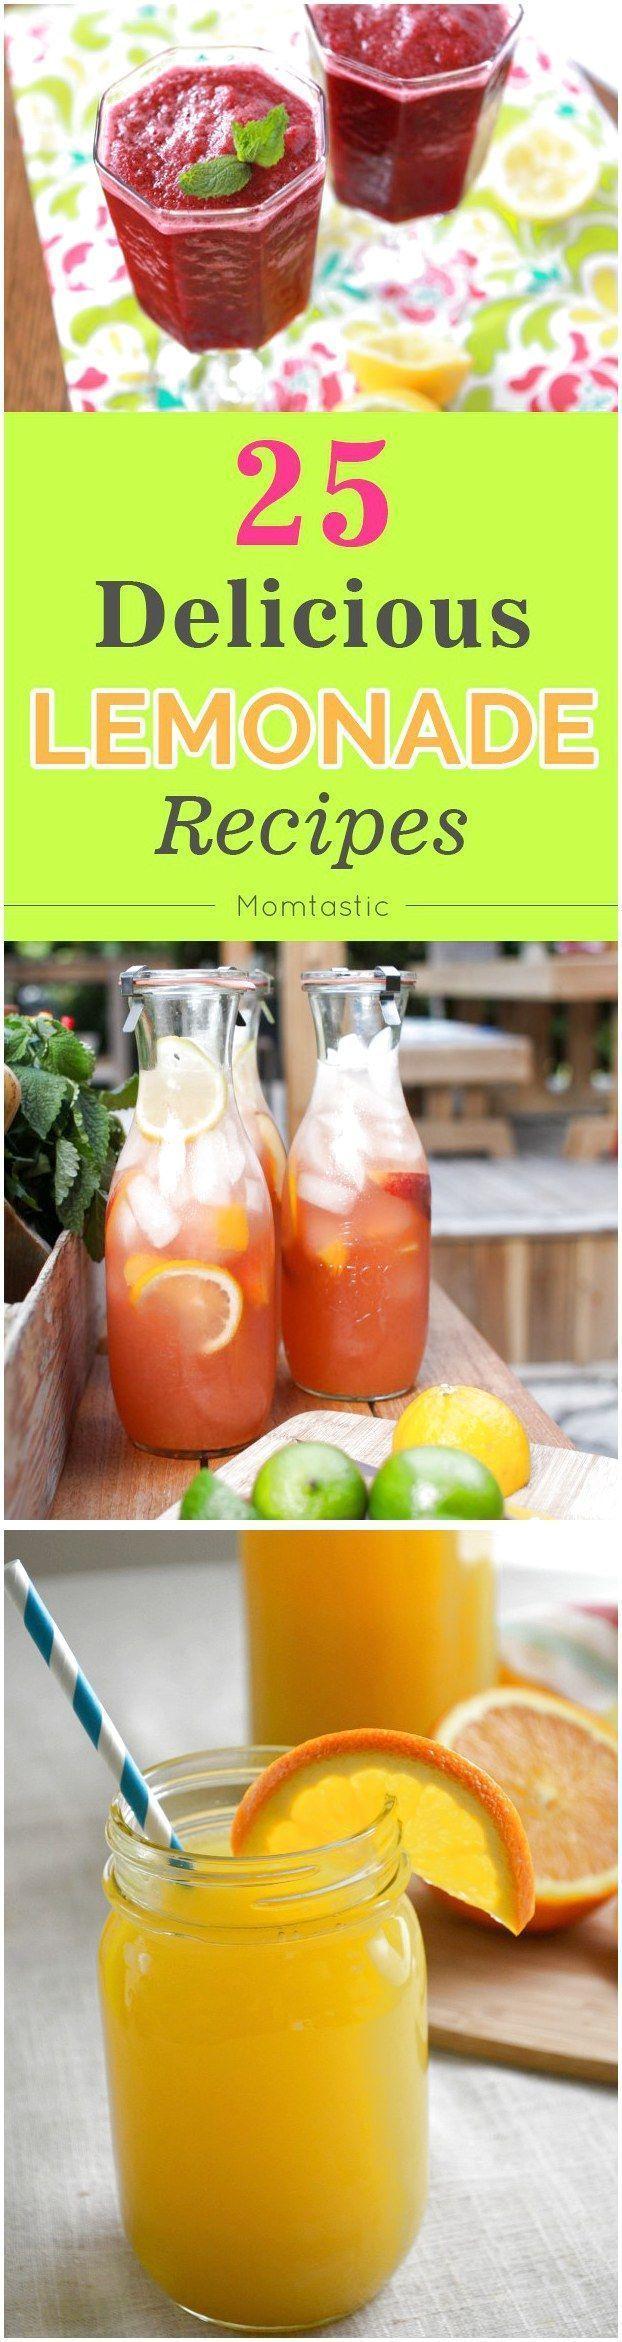 The 25 best lemonade recipes #HealthySmoothiesForKids click now for more. #bestlemonade The 25 best lemonade recipes #HealthySmoothiesForKids click now for more. #bestlemonade The 25 best lemonade recipes #HealthySmoothiesForKids click now for more. #bestlemonade The 25 best lemonade recipes #HealthySmoothiesForKids click now for more. #bestlemonade The 25 best lemonade recipes #HealthySmoothiesForKids click now for more. #bestlemonade The 25 best lemonade recipes #HealthySmoothiesForKids click #bestlemonade